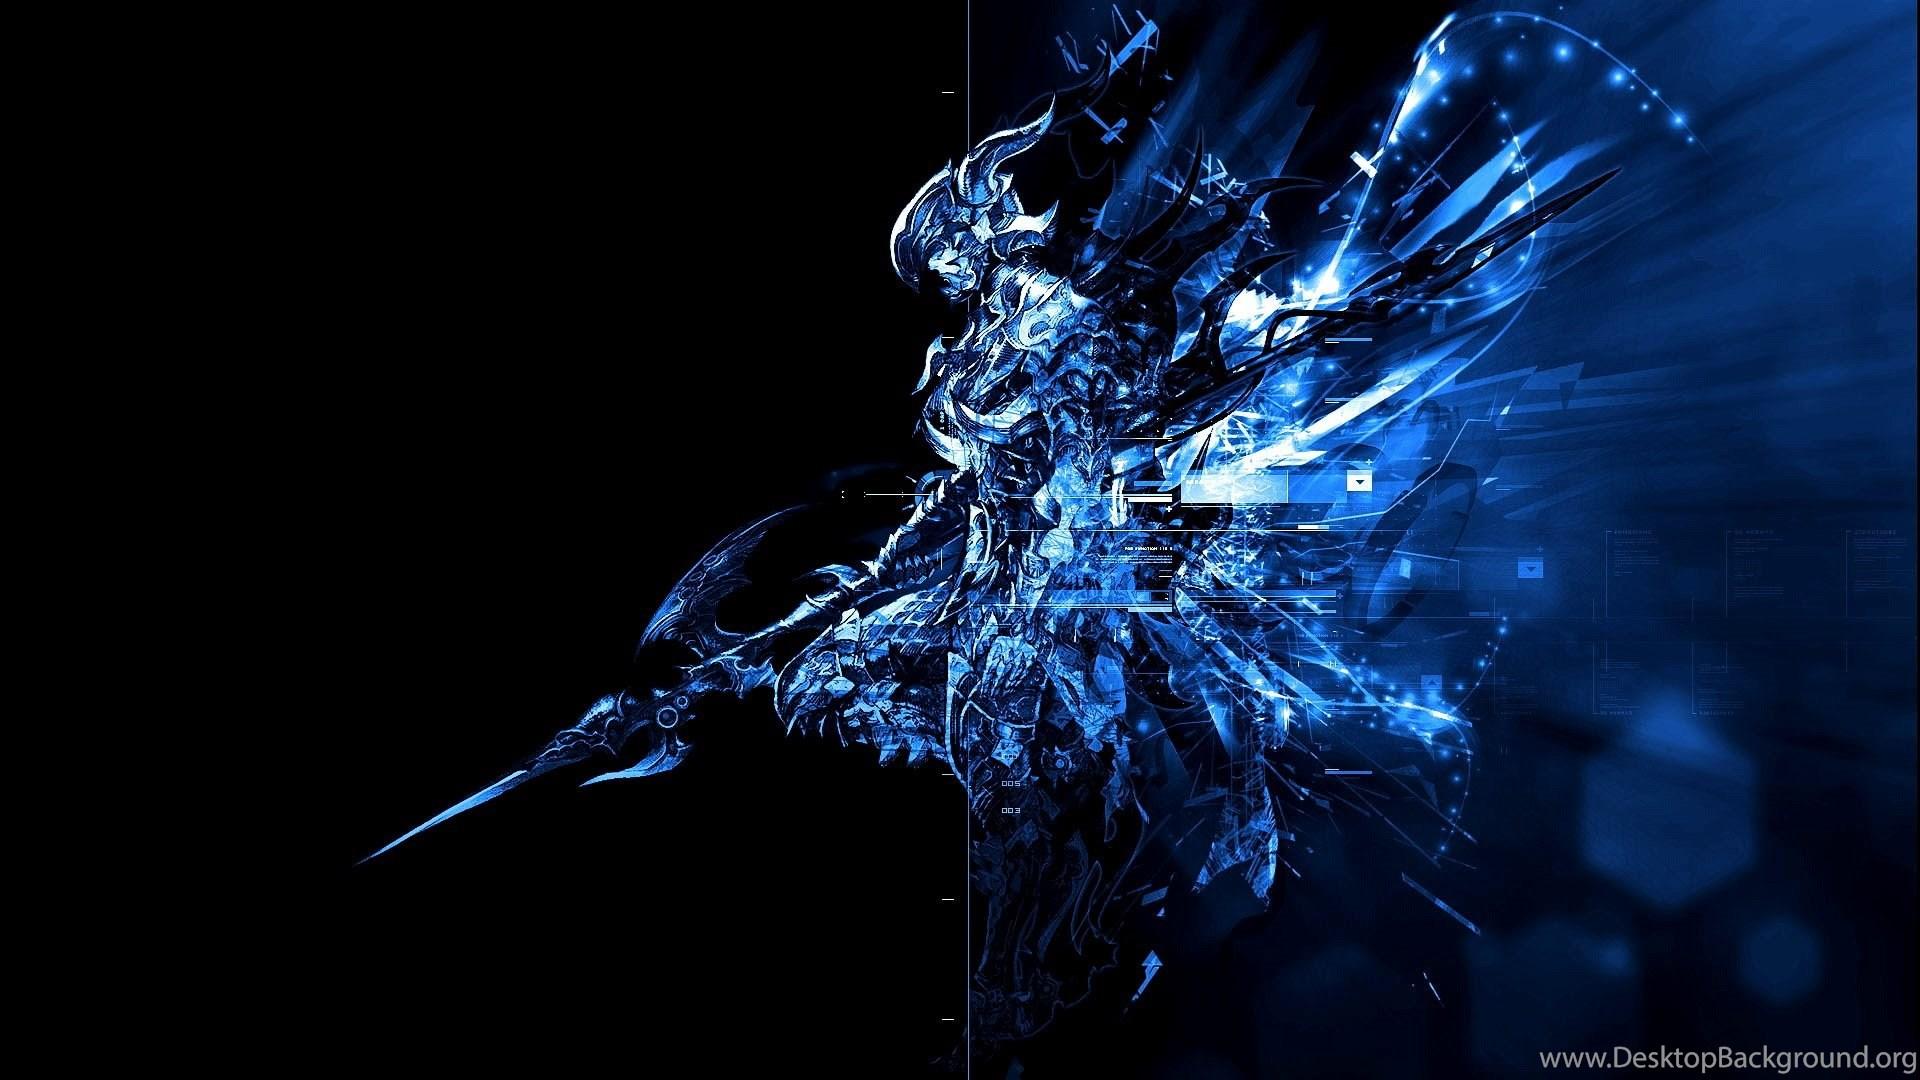 Final Fantasy Xiv Heavensward Hd Wallpapers Desktop Background